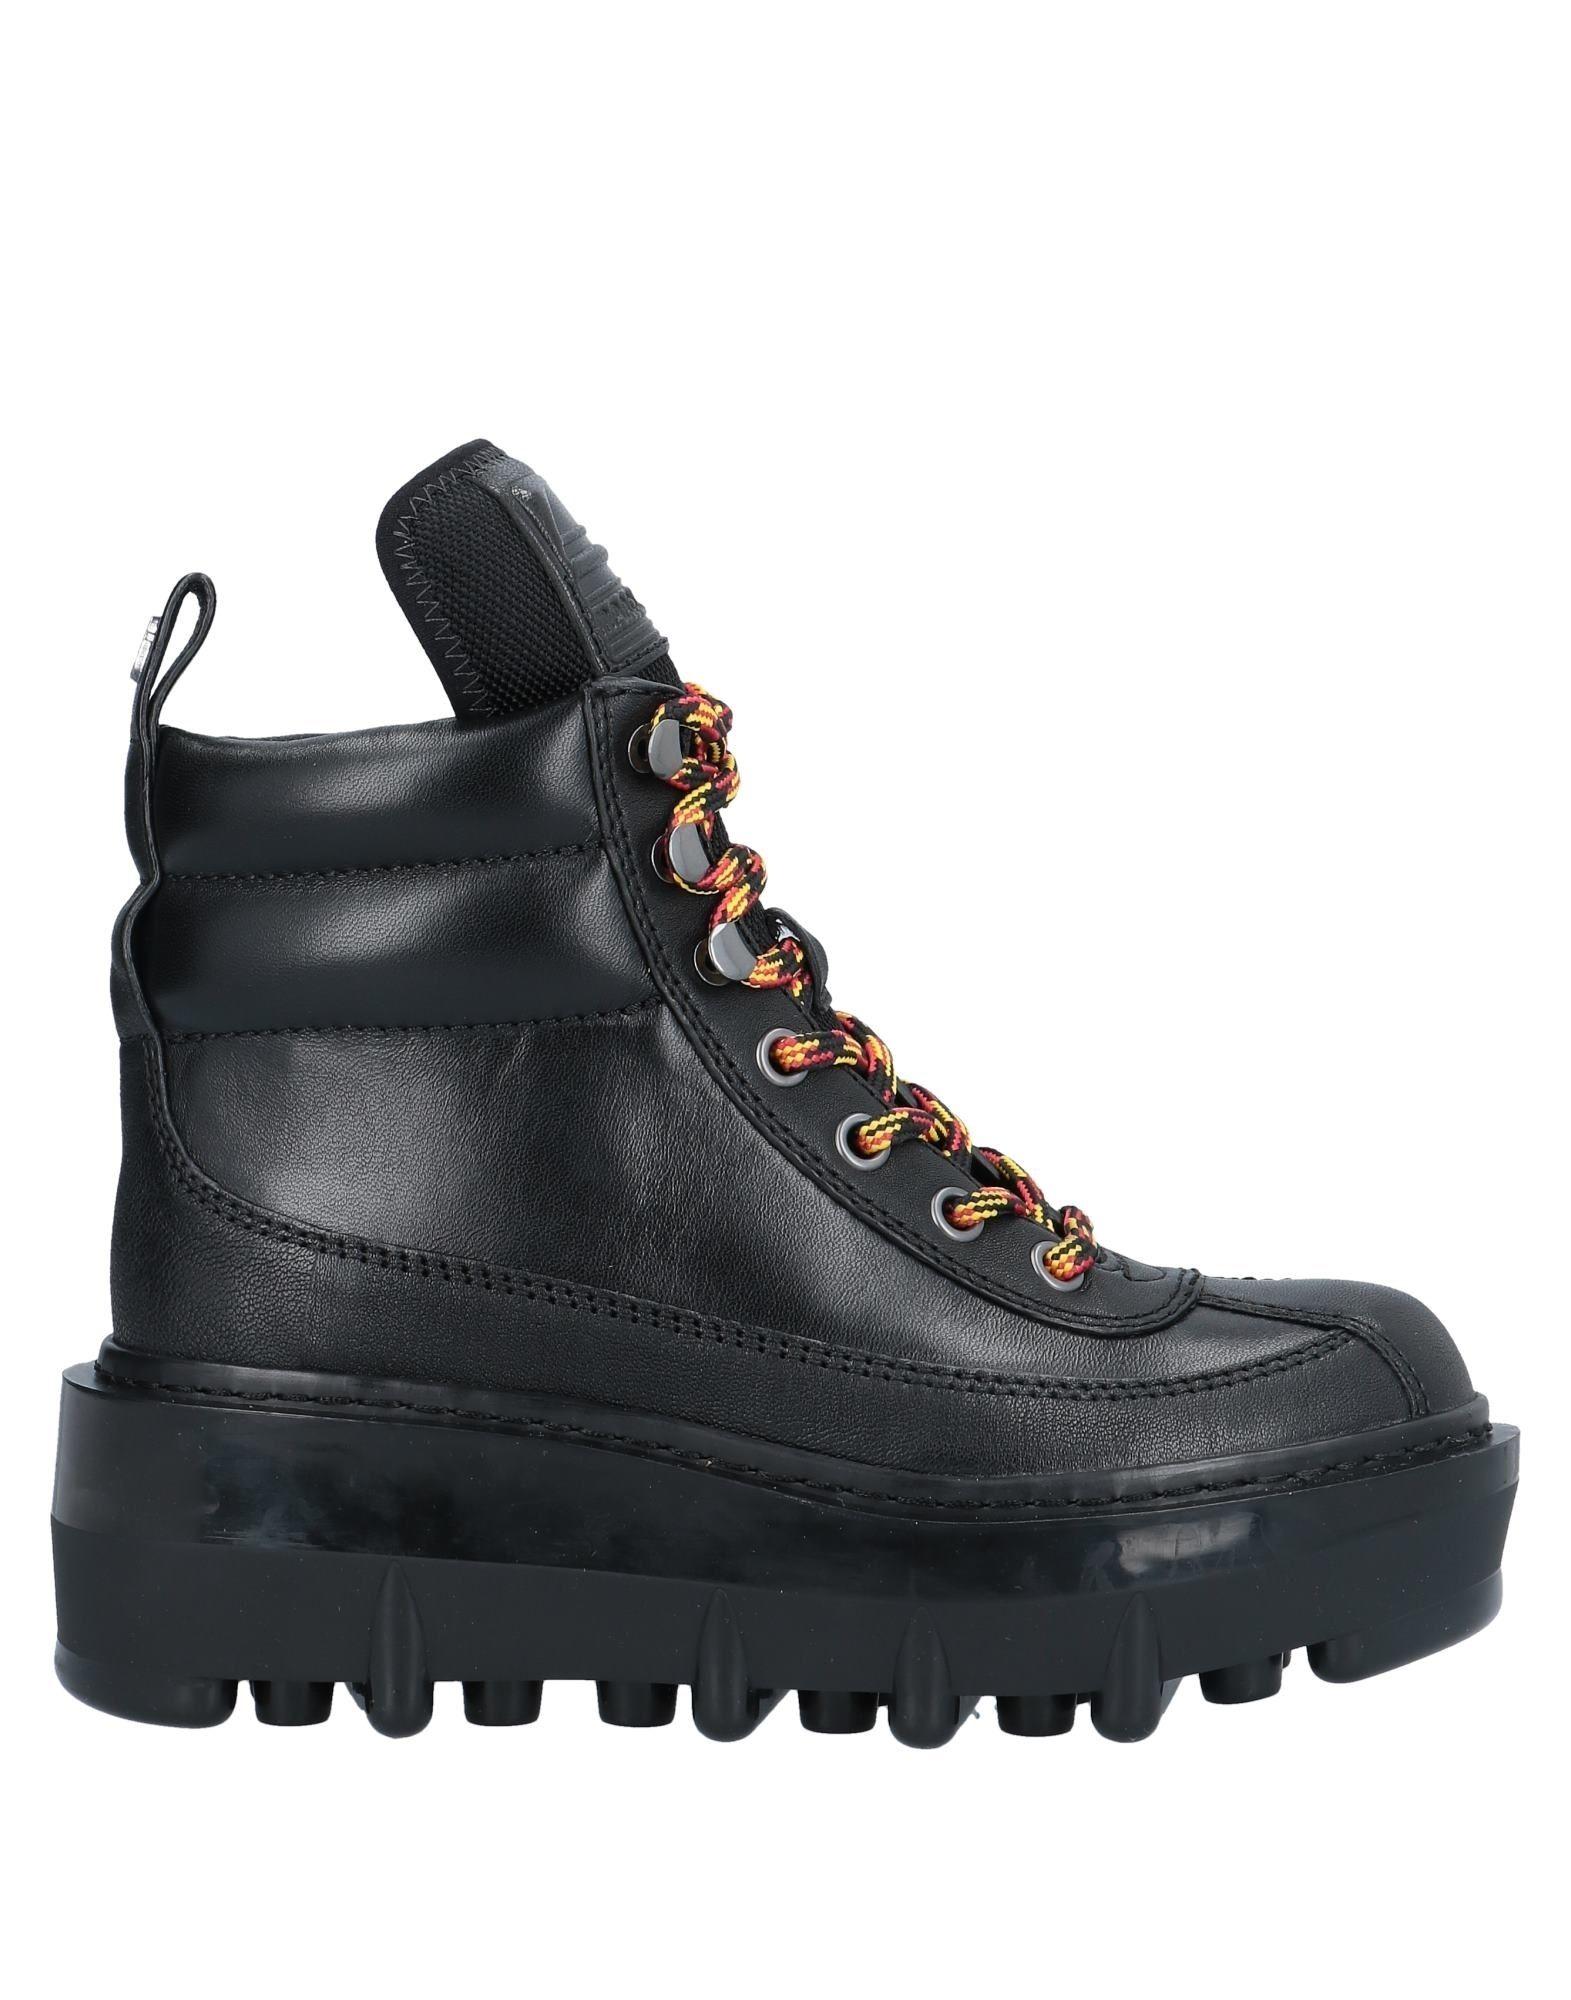 цена MARC JACOBS Полусапоги и высокие ботинки онлайн в 2017 году